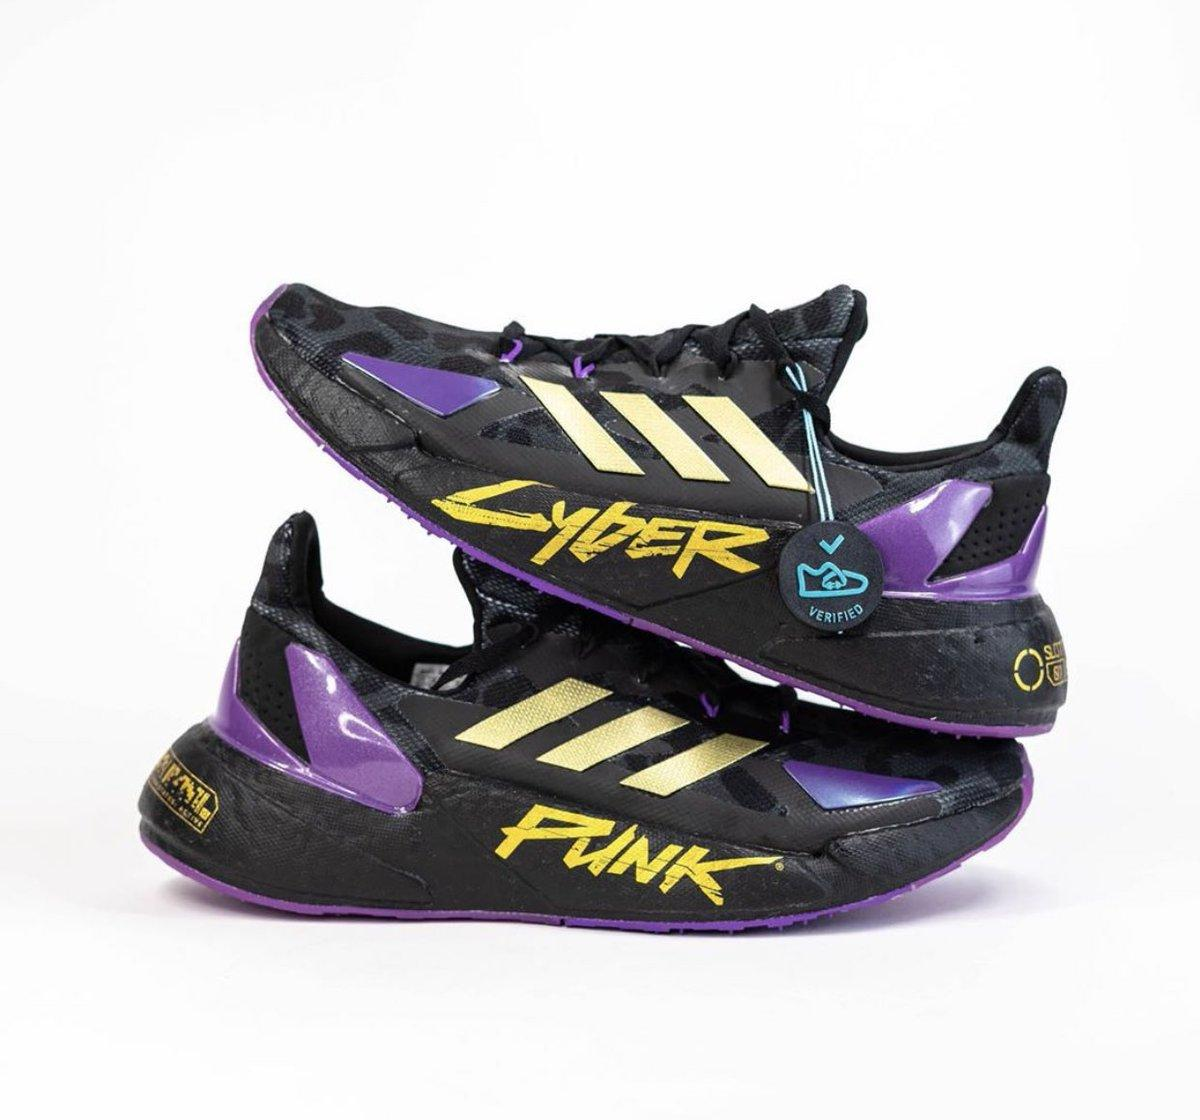 embrague Lluvioso Calma  Así son las futuristas zapatillas de Cyberpunk 2077 que Adidas aún no ha  anunciado - HobbyConsolas Juegos